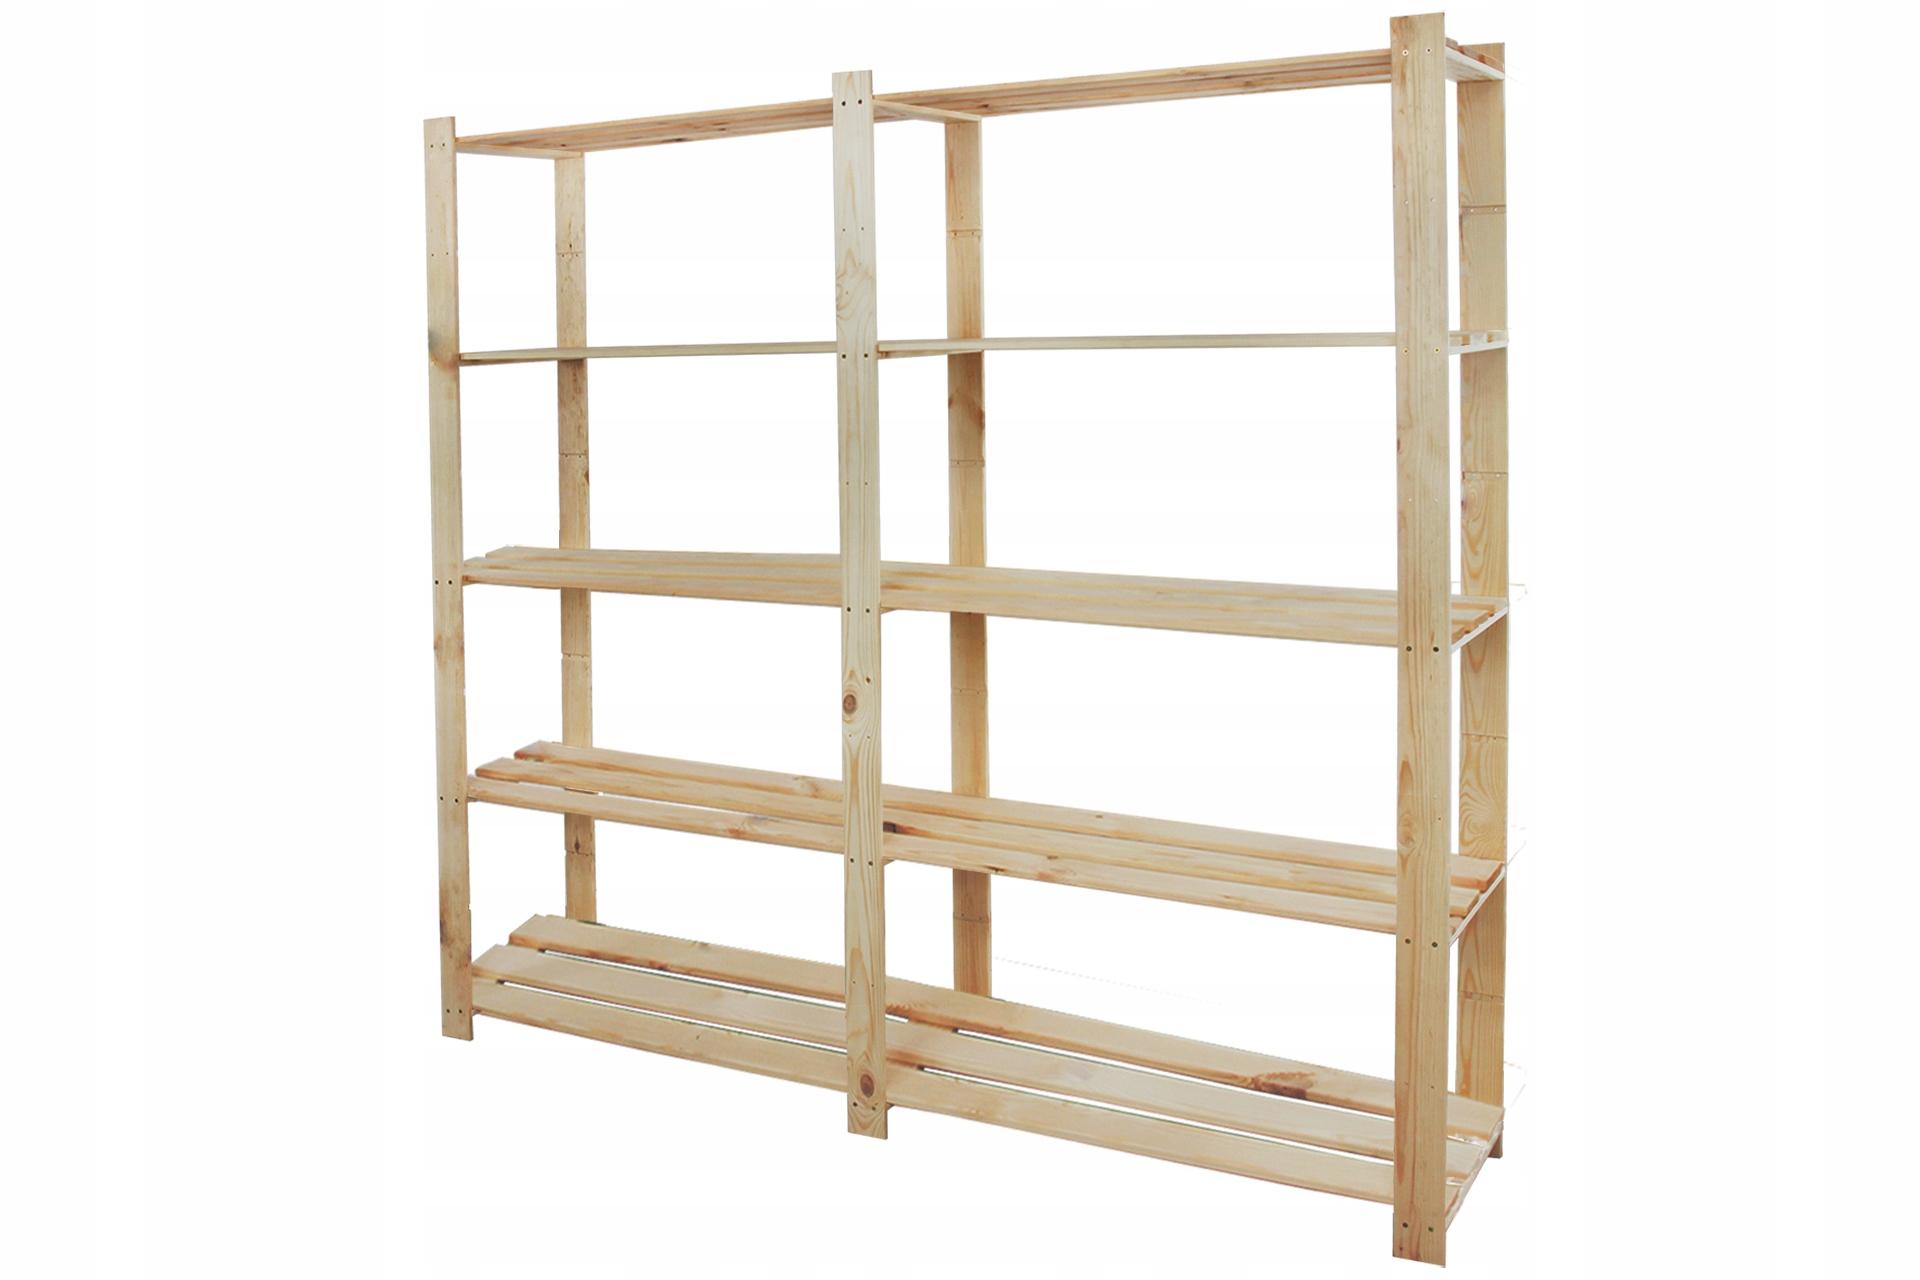 Stojan na kancelárske B-02 170x170x28 5 pult drevený